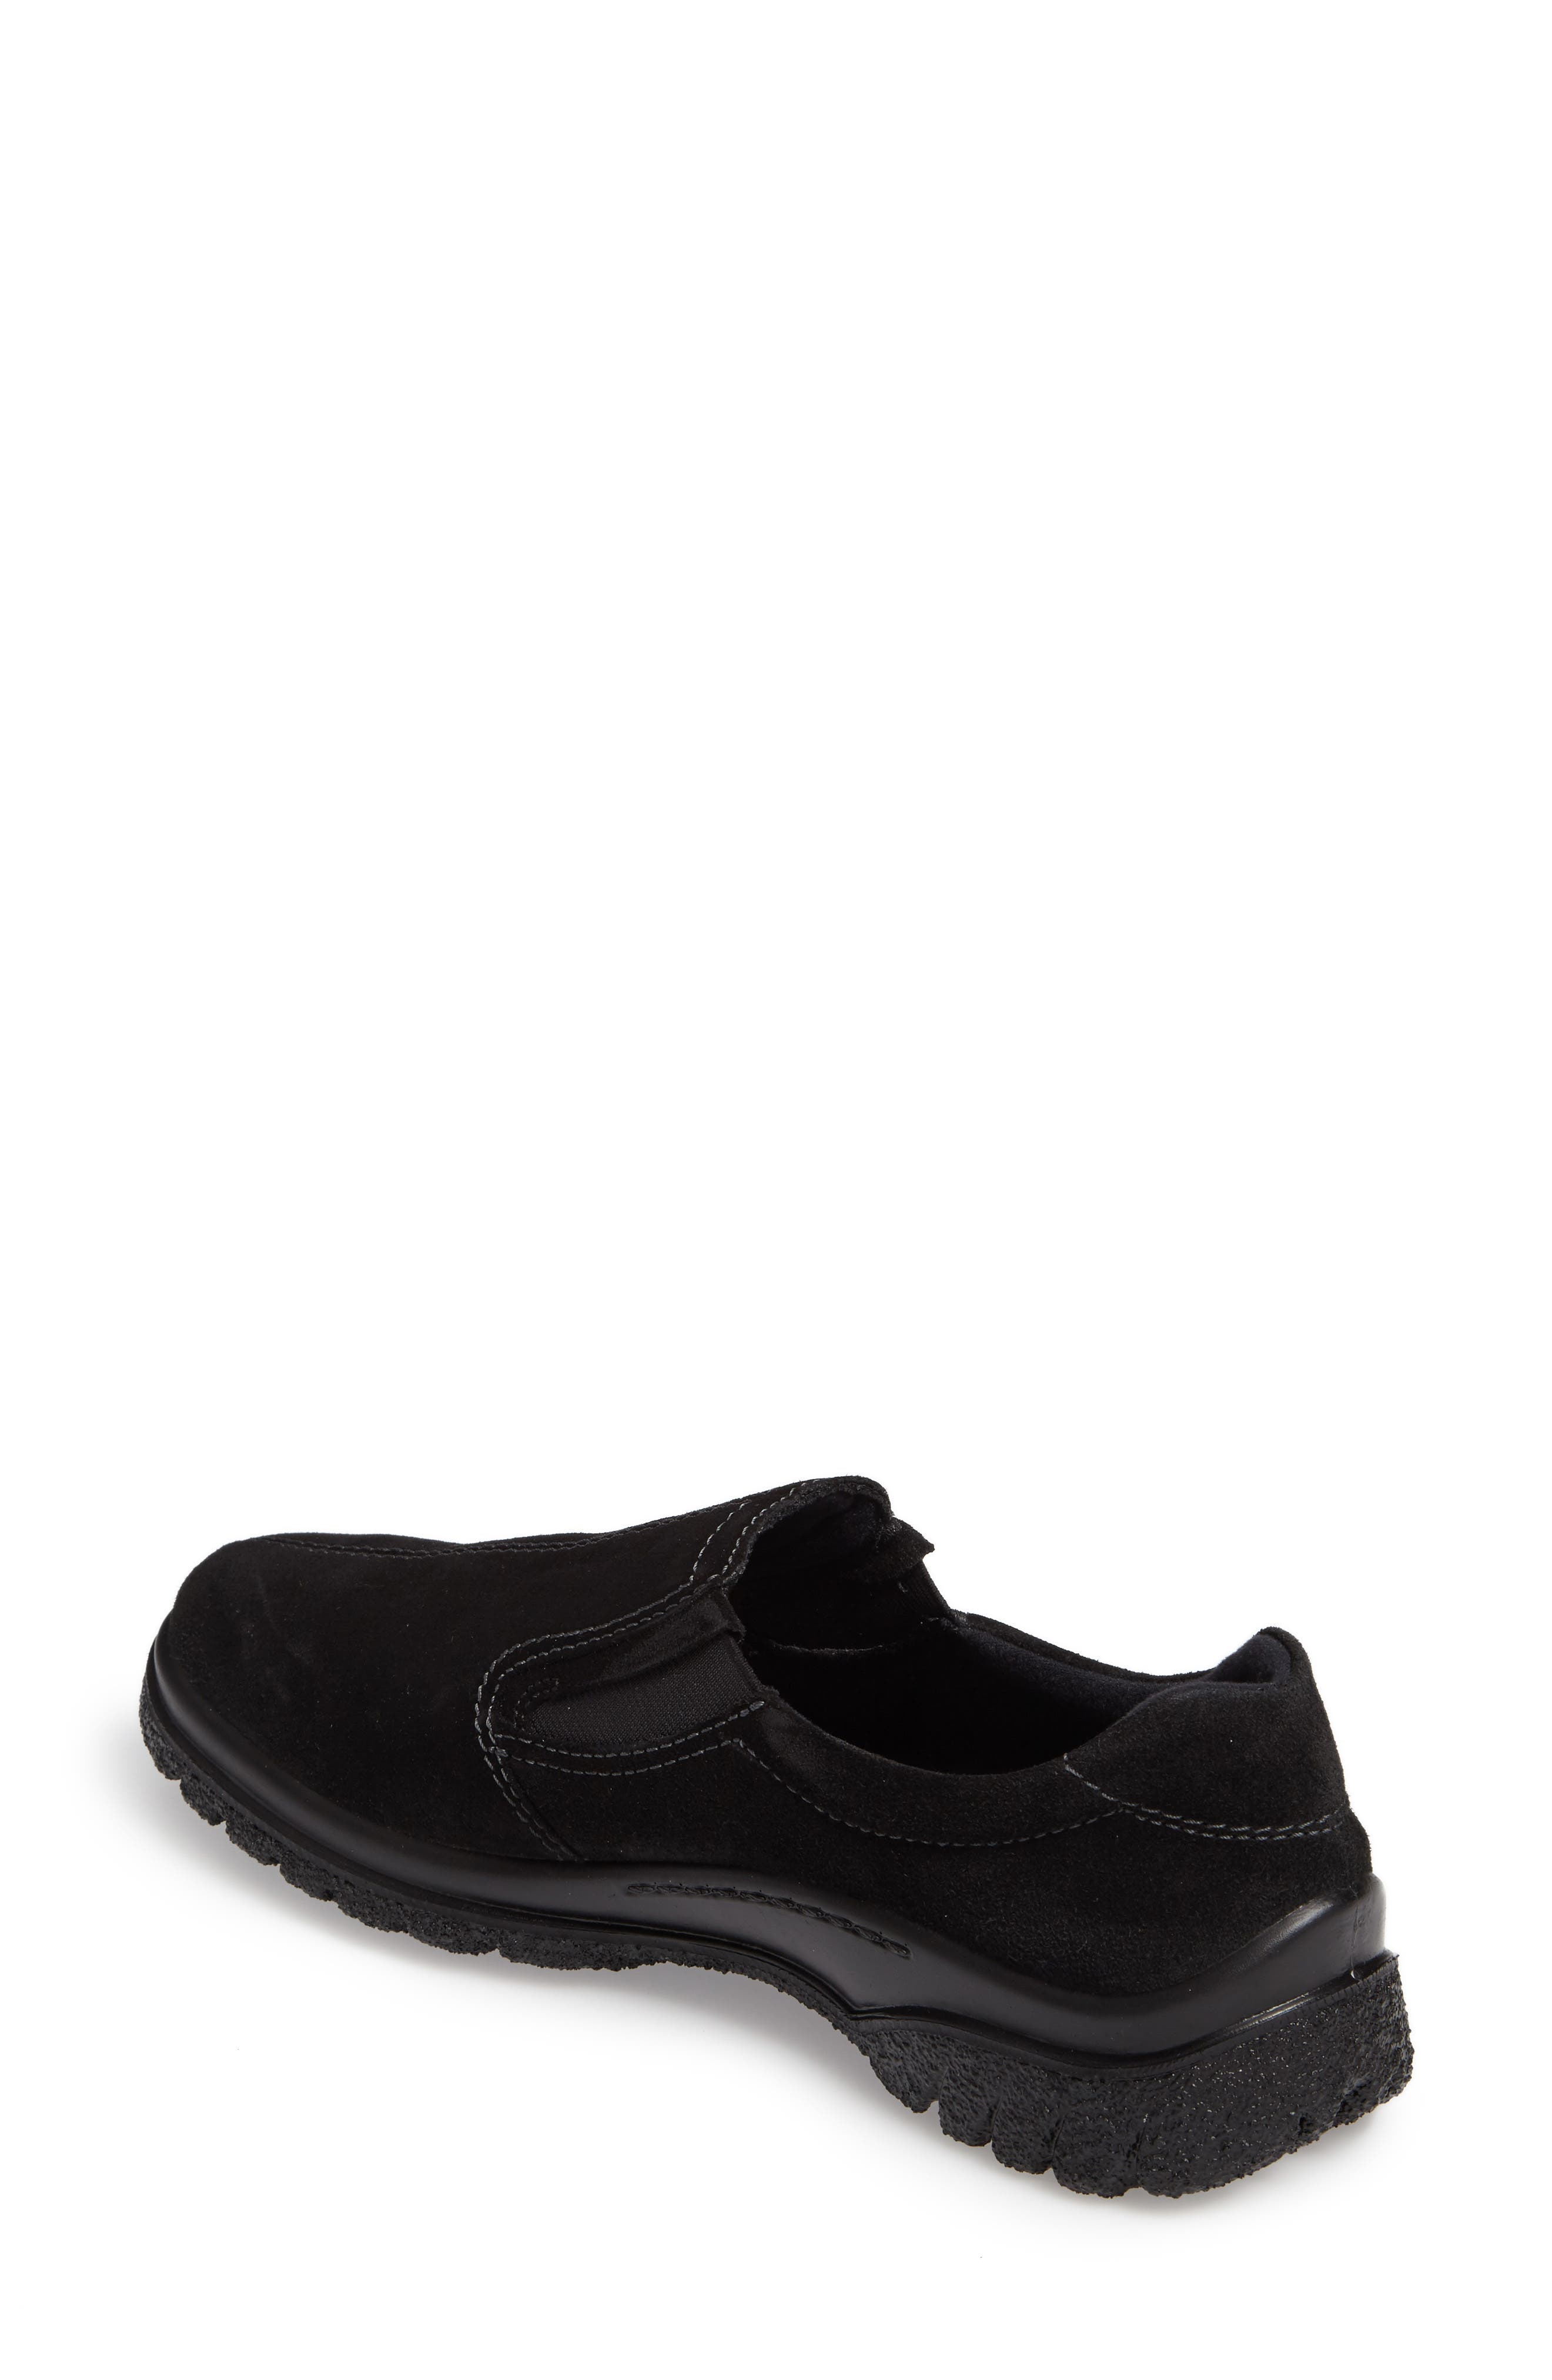 Parson Waterproof Gore-Tex<sup>®</sup> Slip-On Sneaker,                             Alternate thumbnail 2, color,                             001